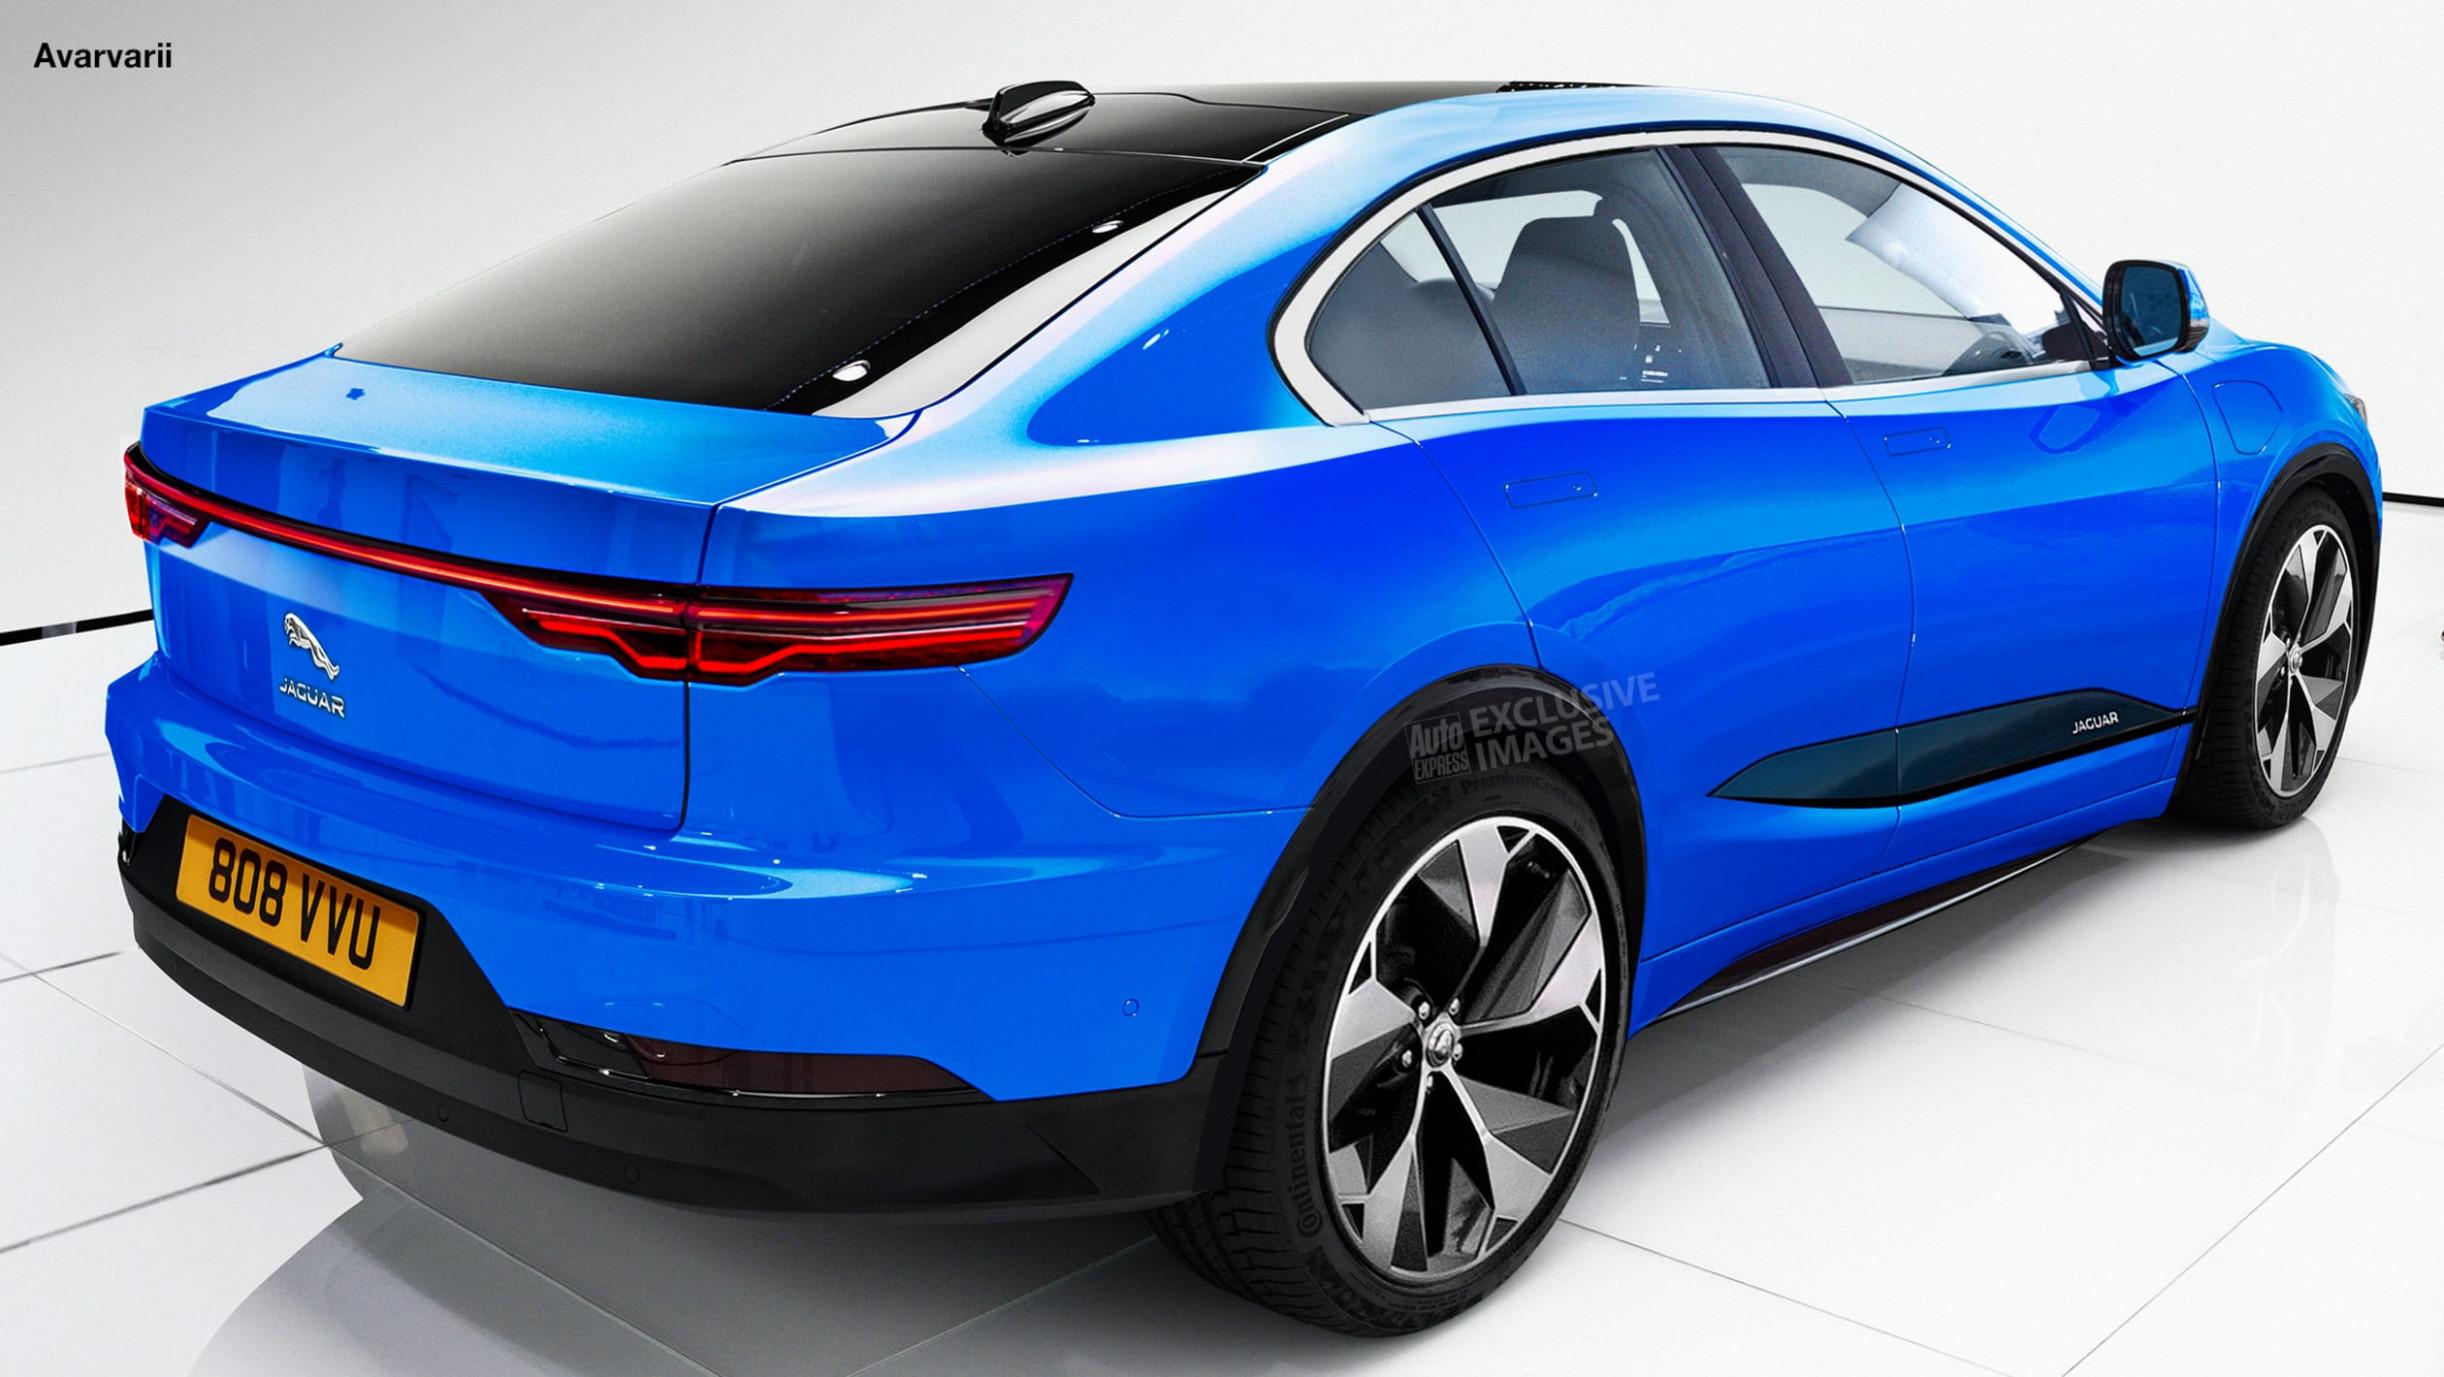 Spesification 2022 Jaguar Xj Images